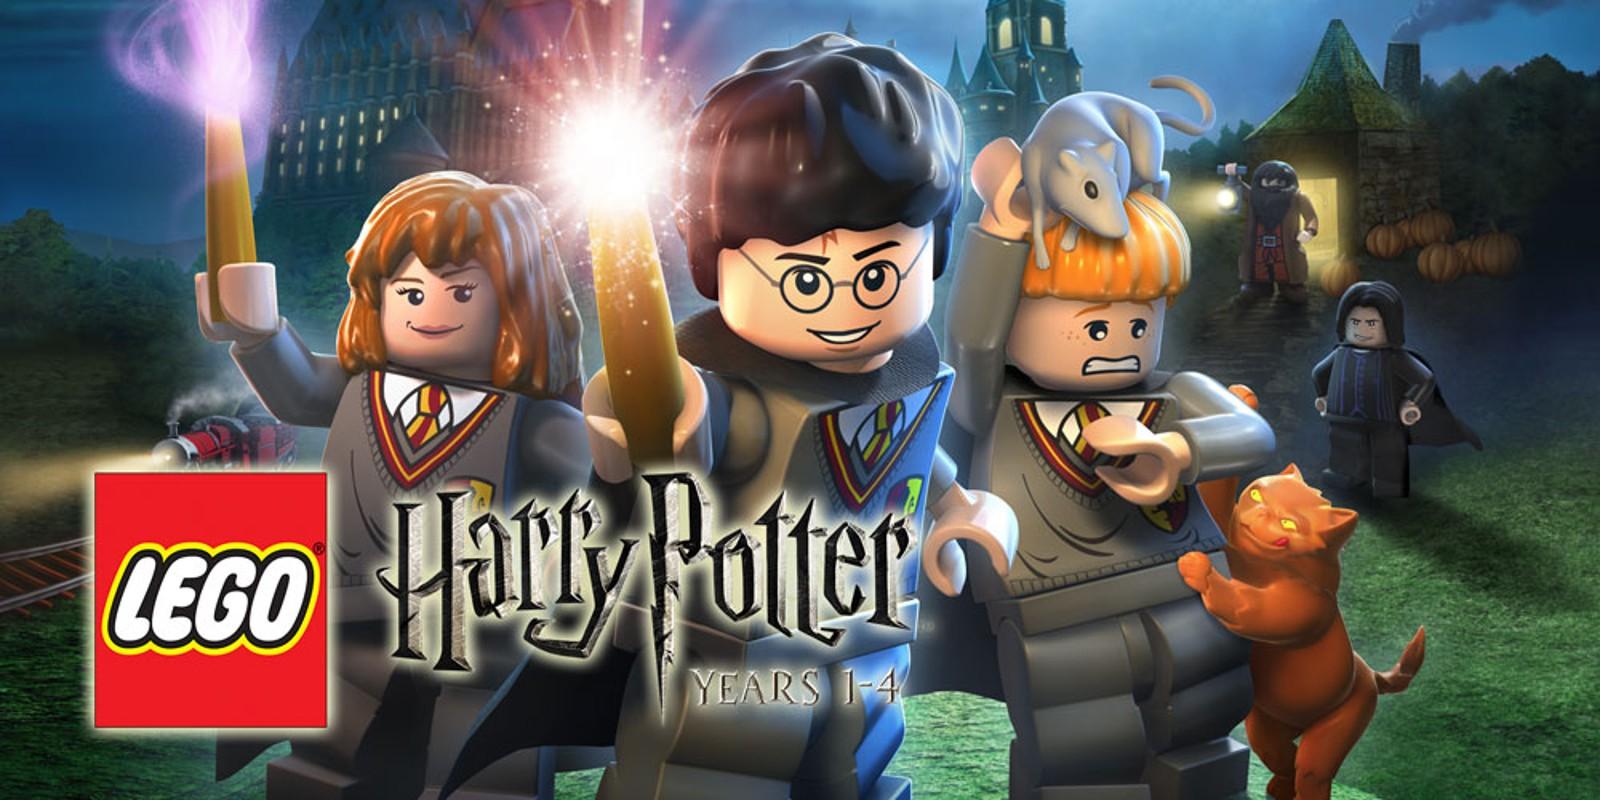 Lego harry potter game nintendo switch